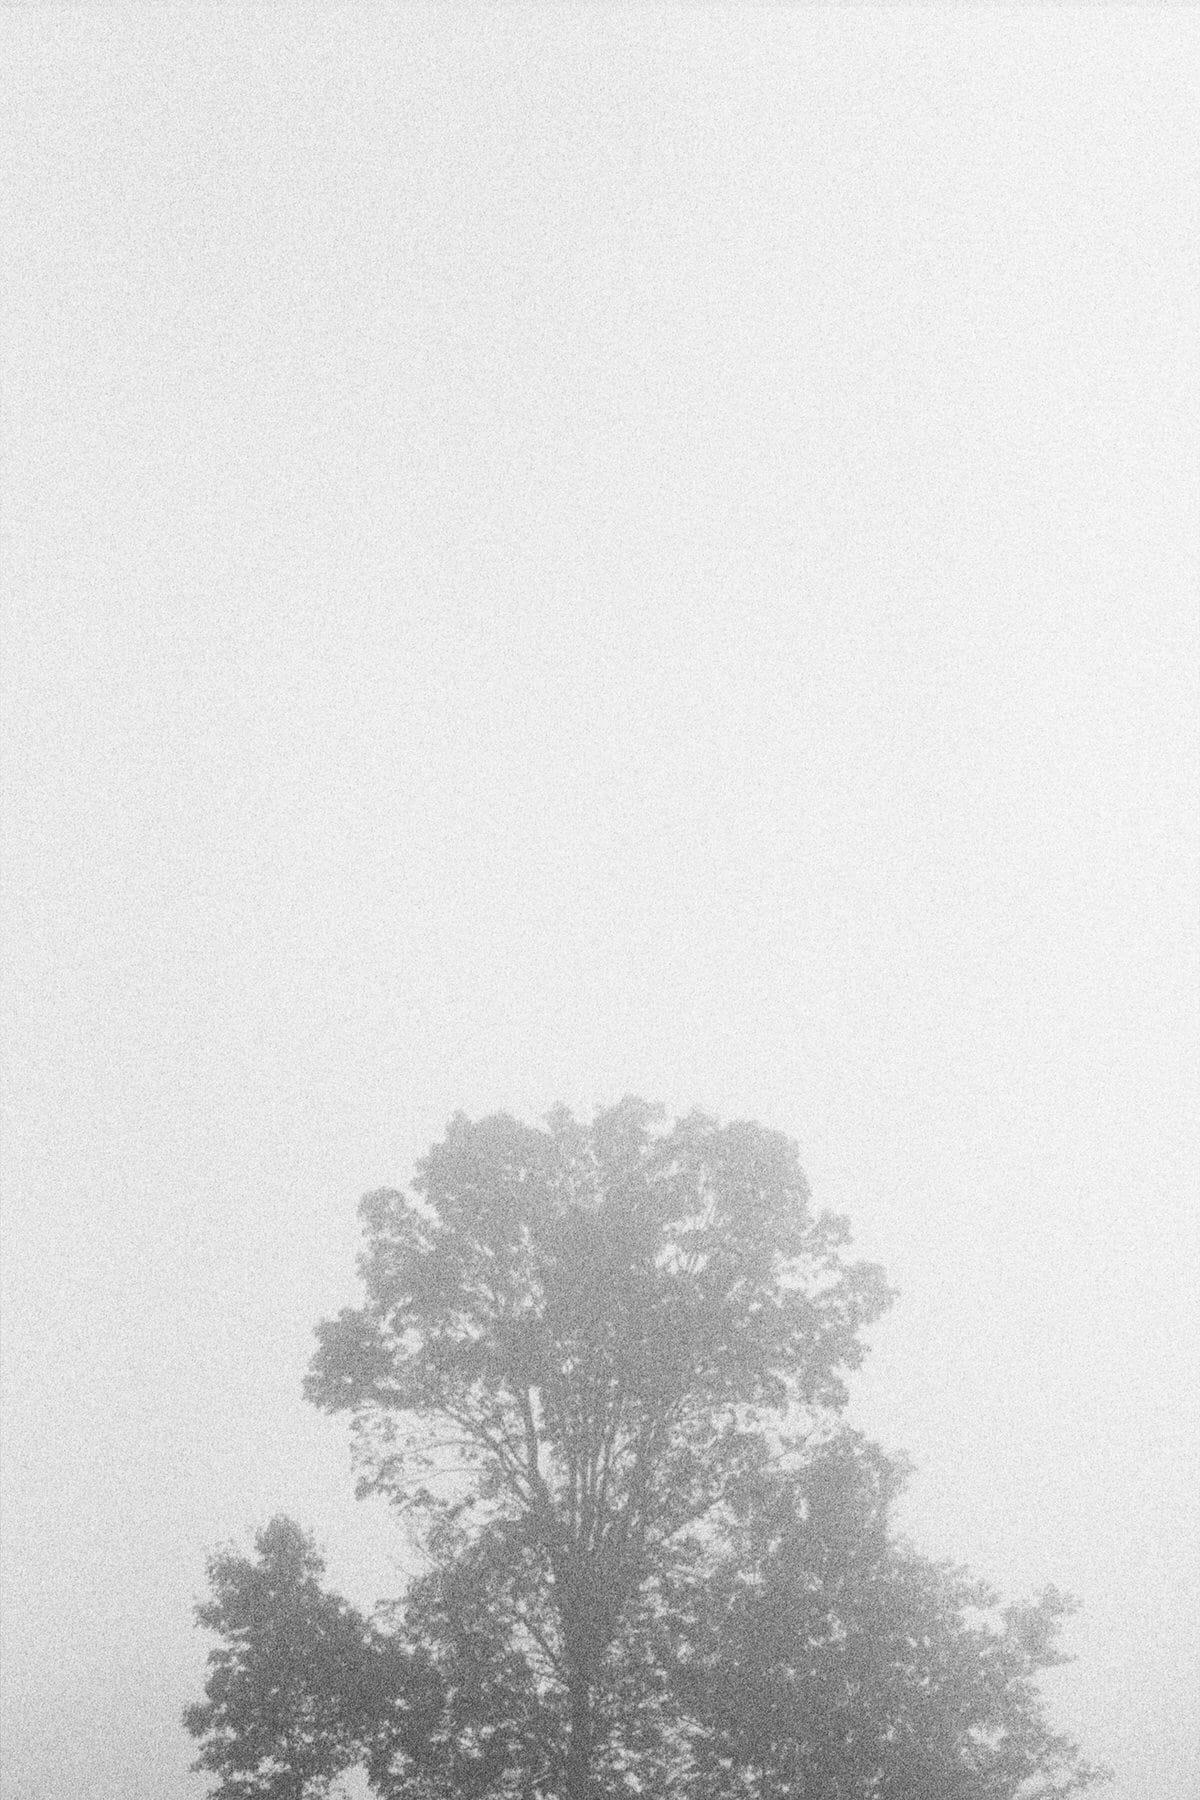 Solo-tree-black-and-white-fine-art-film-photography-by-Studio-L-photographer-Laura-Schneider-_001